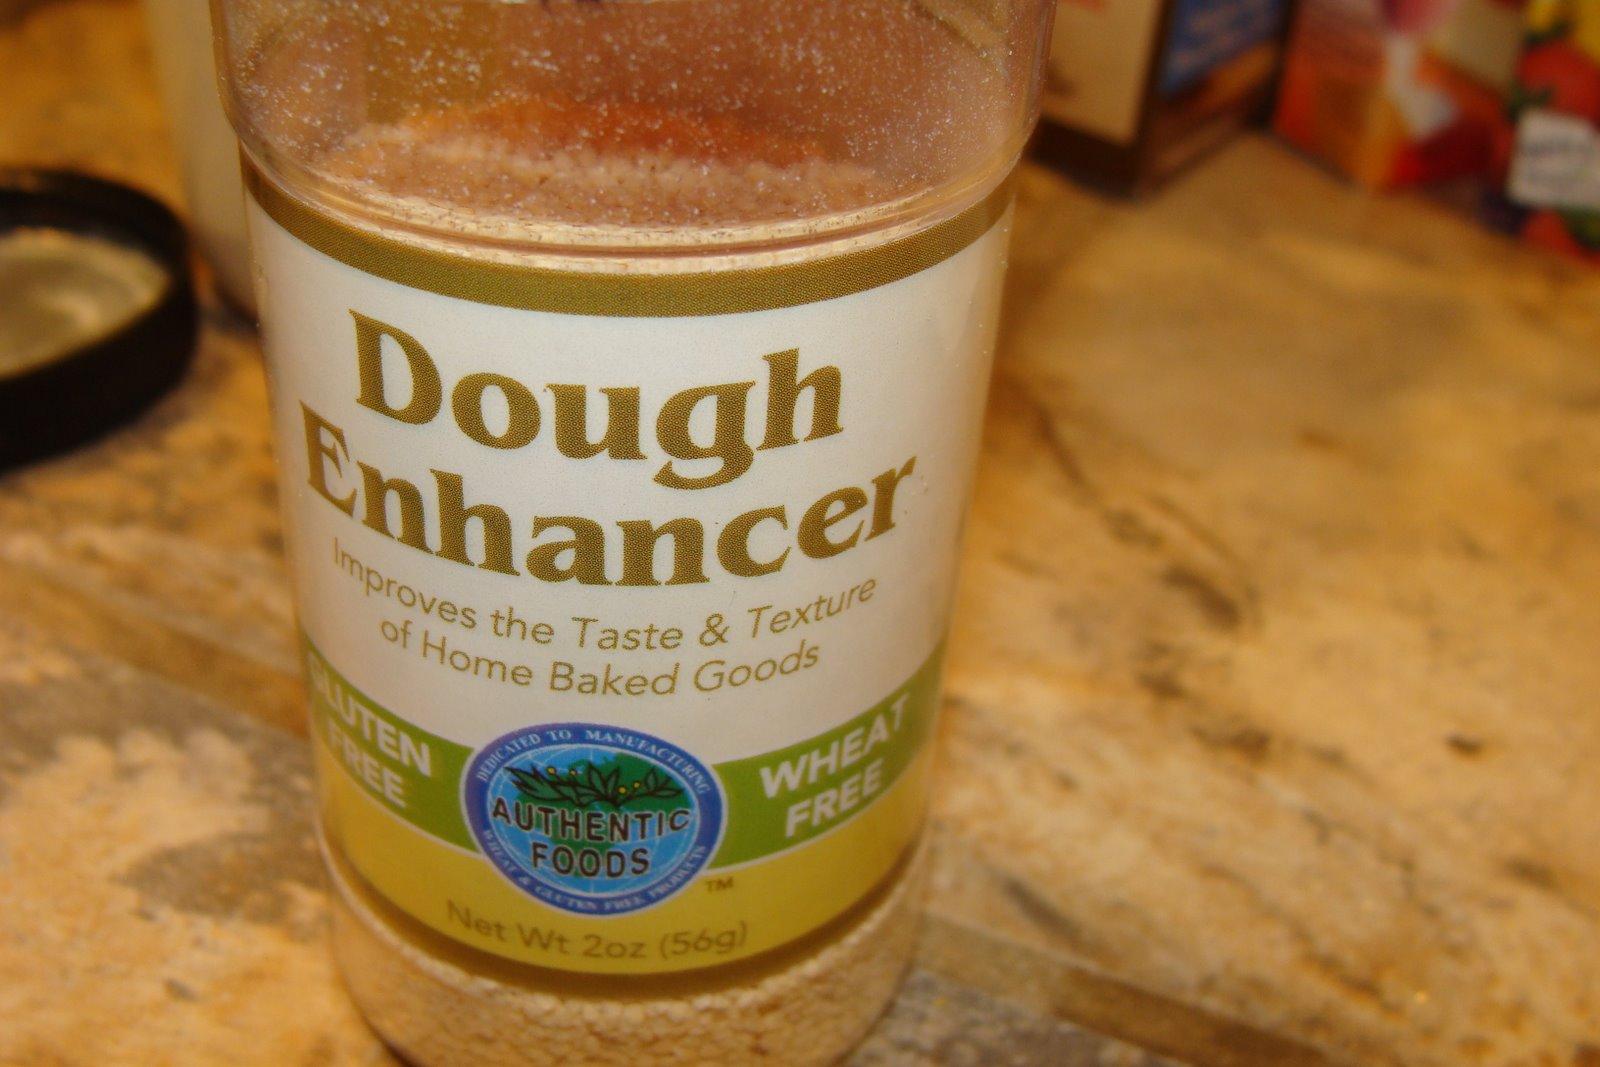 [dough+enhancer+2.jpg]